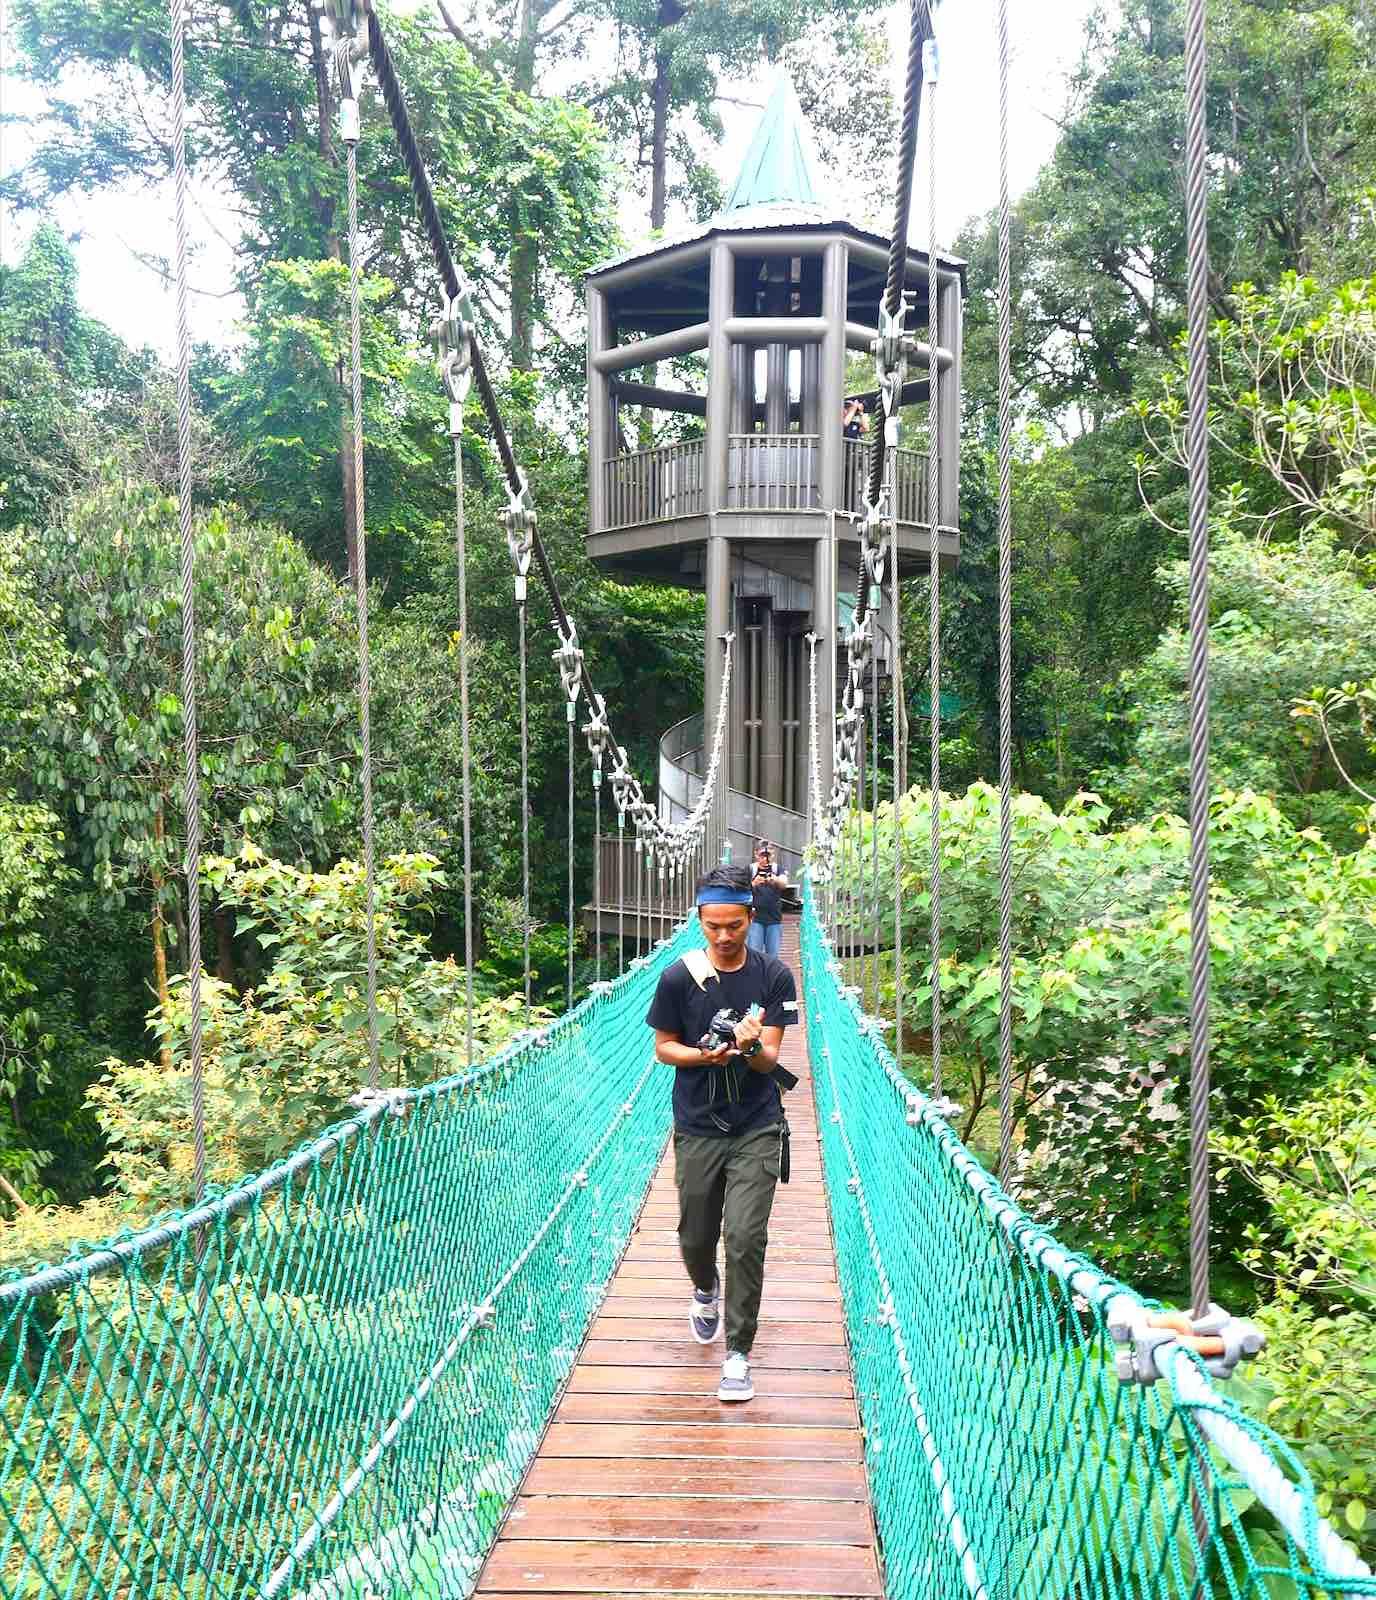 canopy-walk-kuala-lumpur-malaysia-aspirantsg